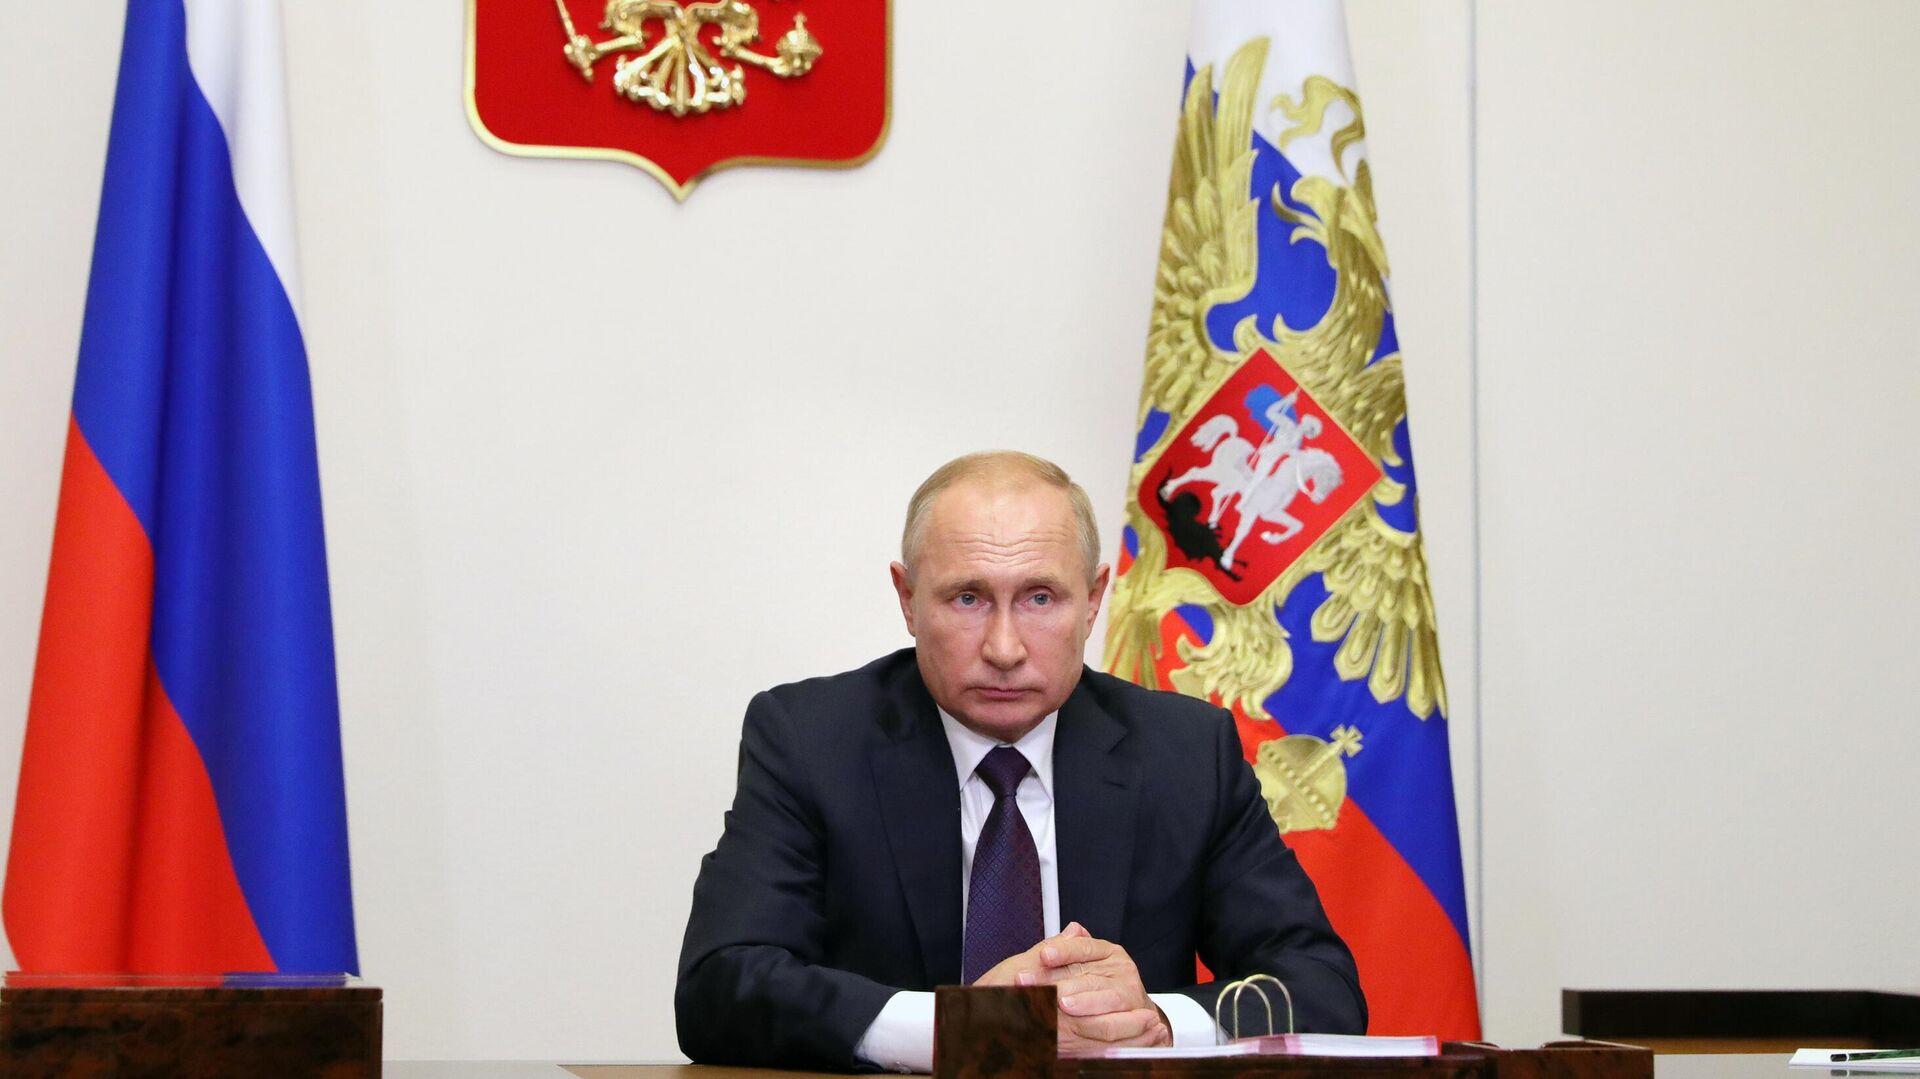 Президент РФ Владимир Путин - РИА Новости, 1920, 10.09.2020